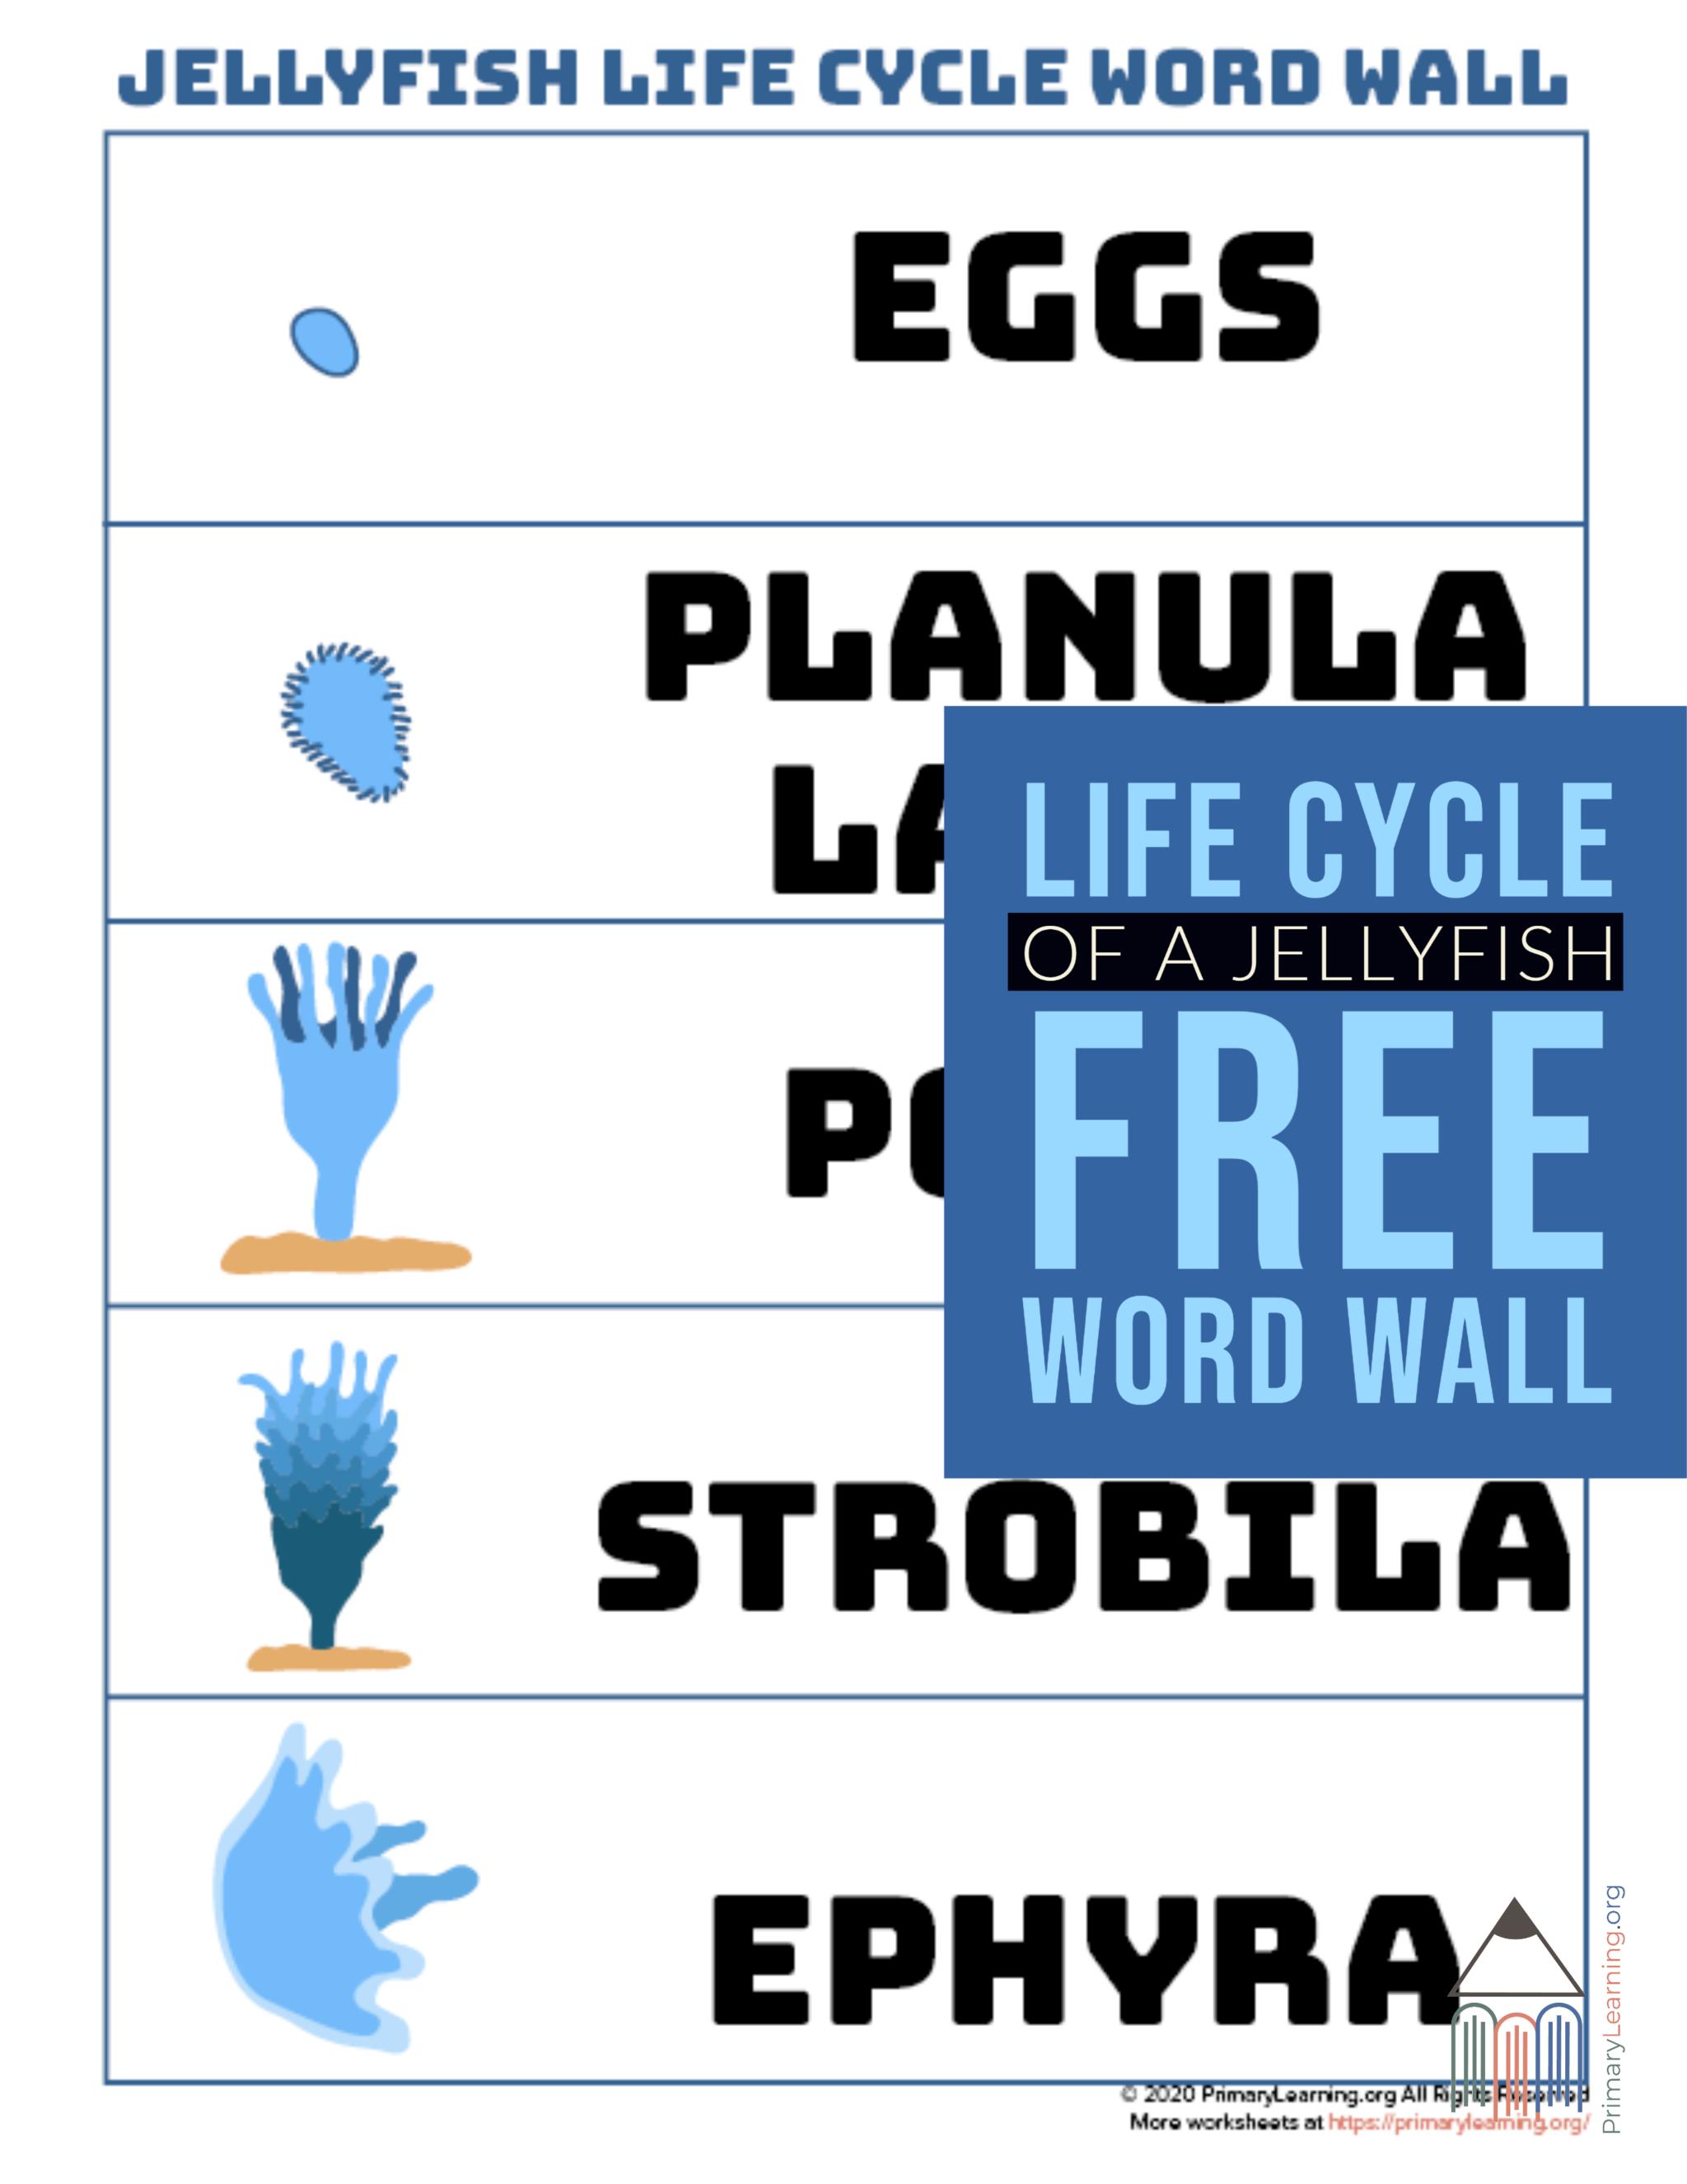 Jellyfish Life Cycle Word Wall